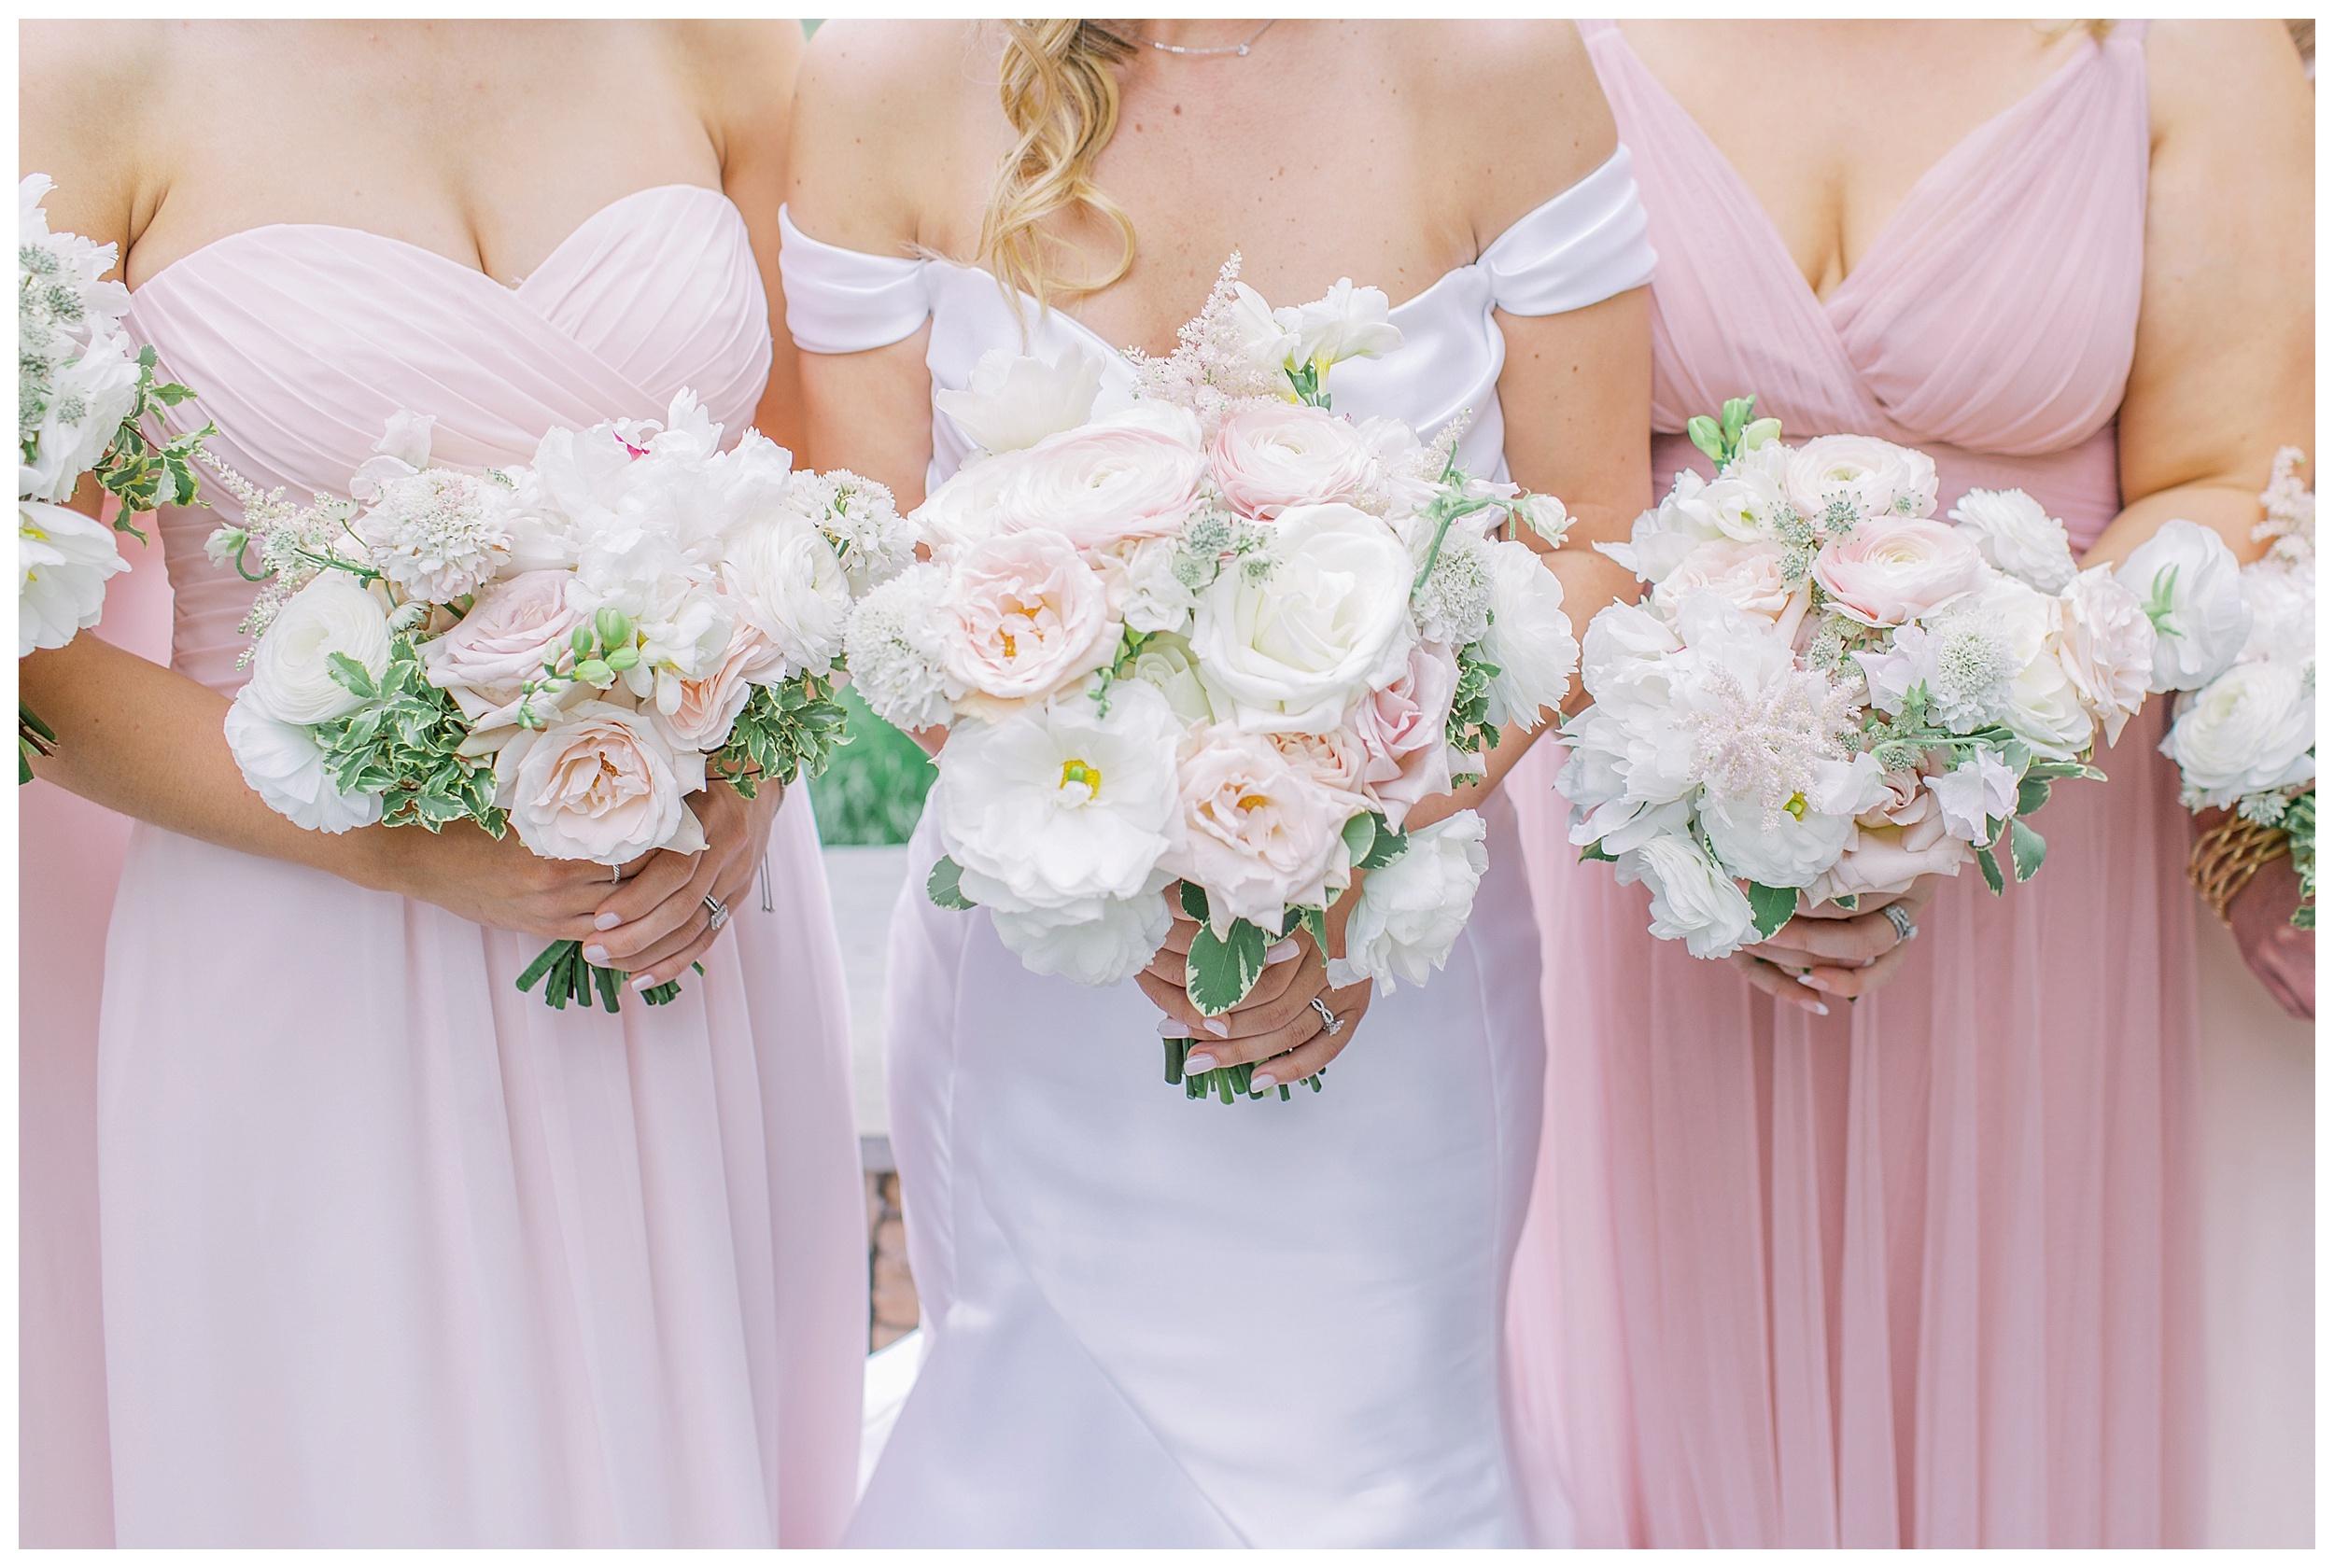 Lansdowne Resort Wedding | Virginia Film Wedding Photographer Kir Tuben_0028.jpg